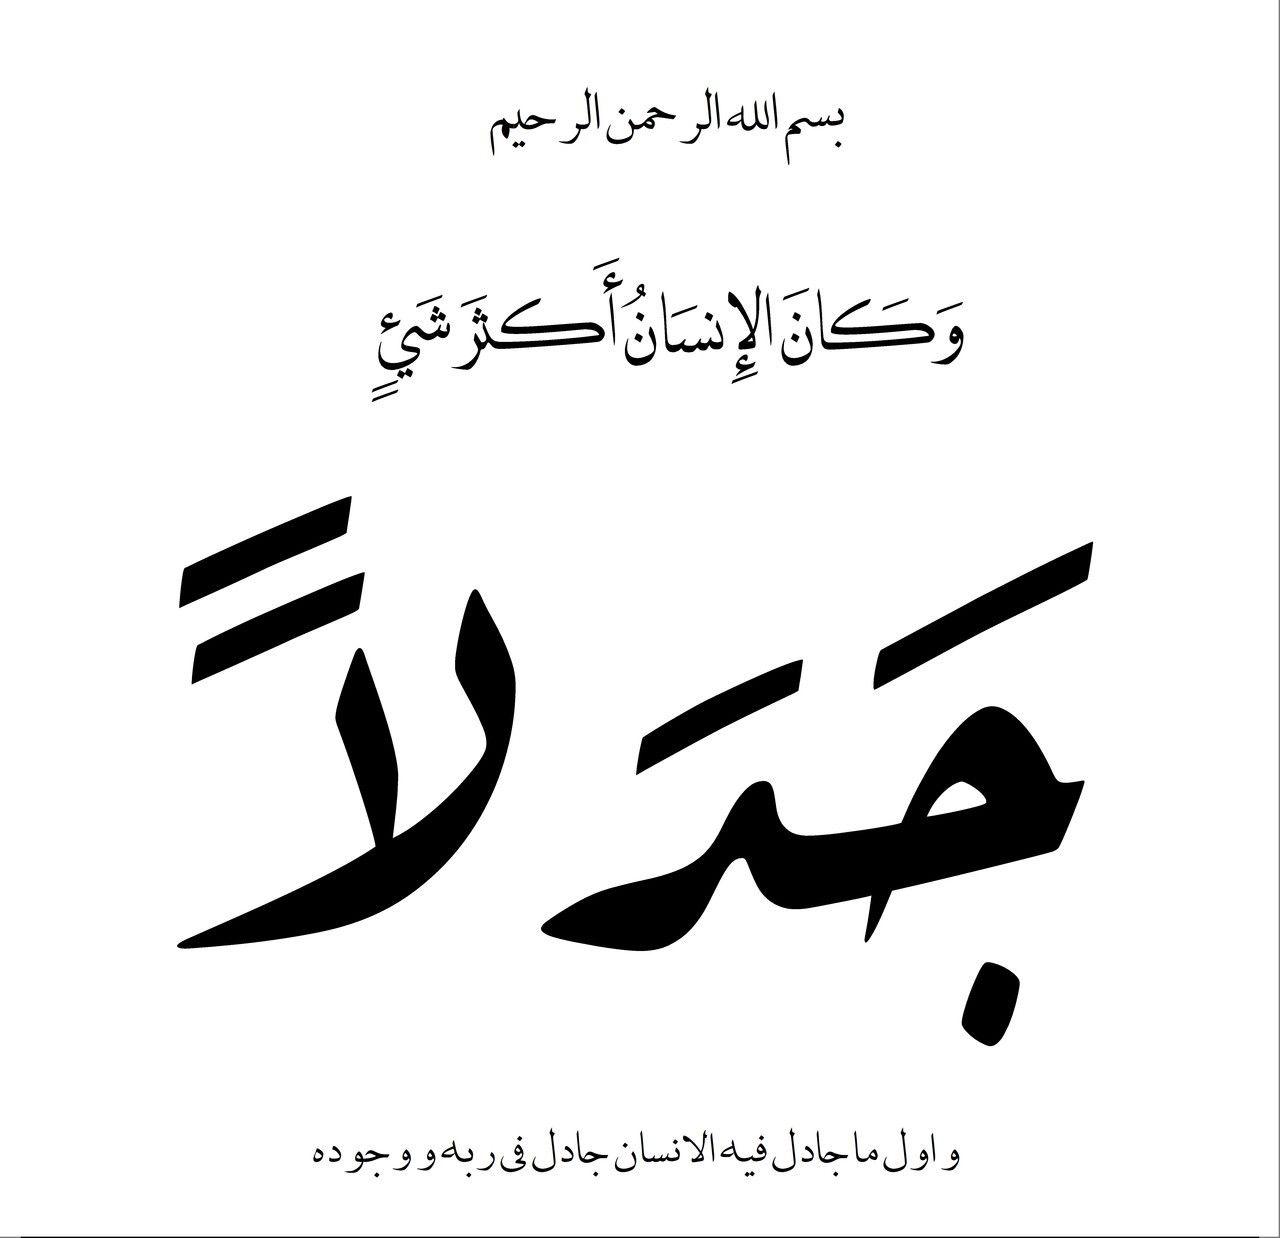 و كان الانسان اكثر شىء جدلا Quran Verses Islamic Messages Words Quotes